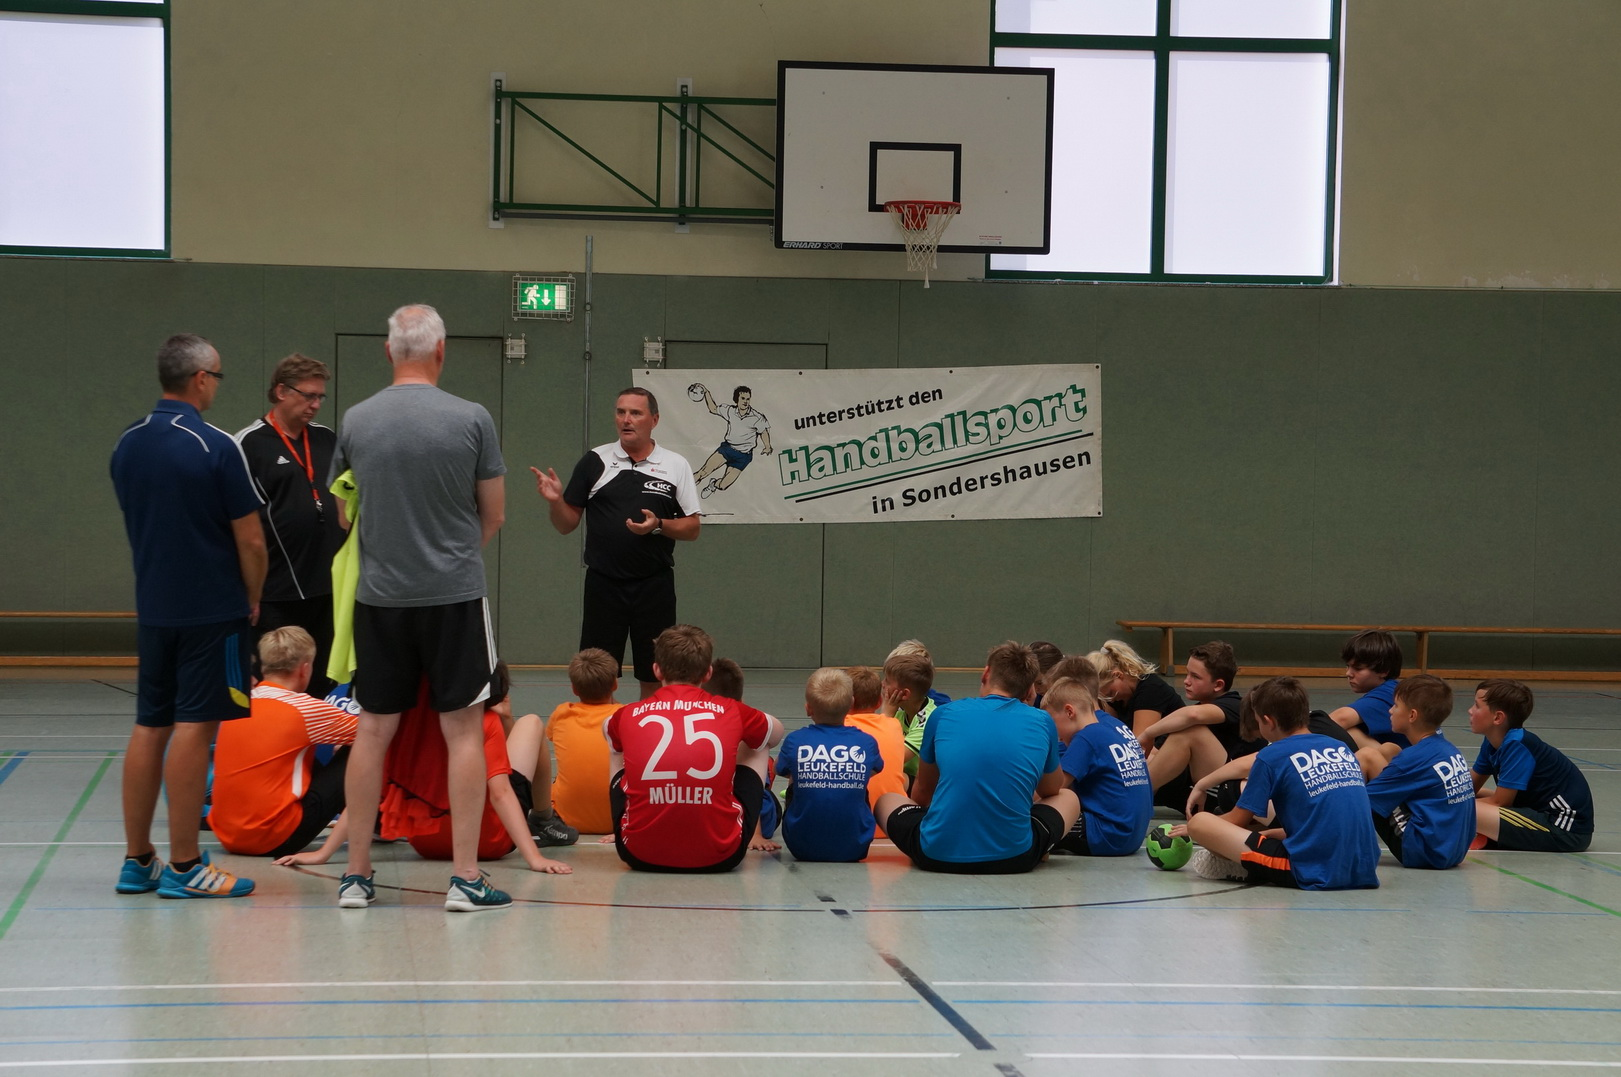 201808_Handballcamp_SDH_MG_292w